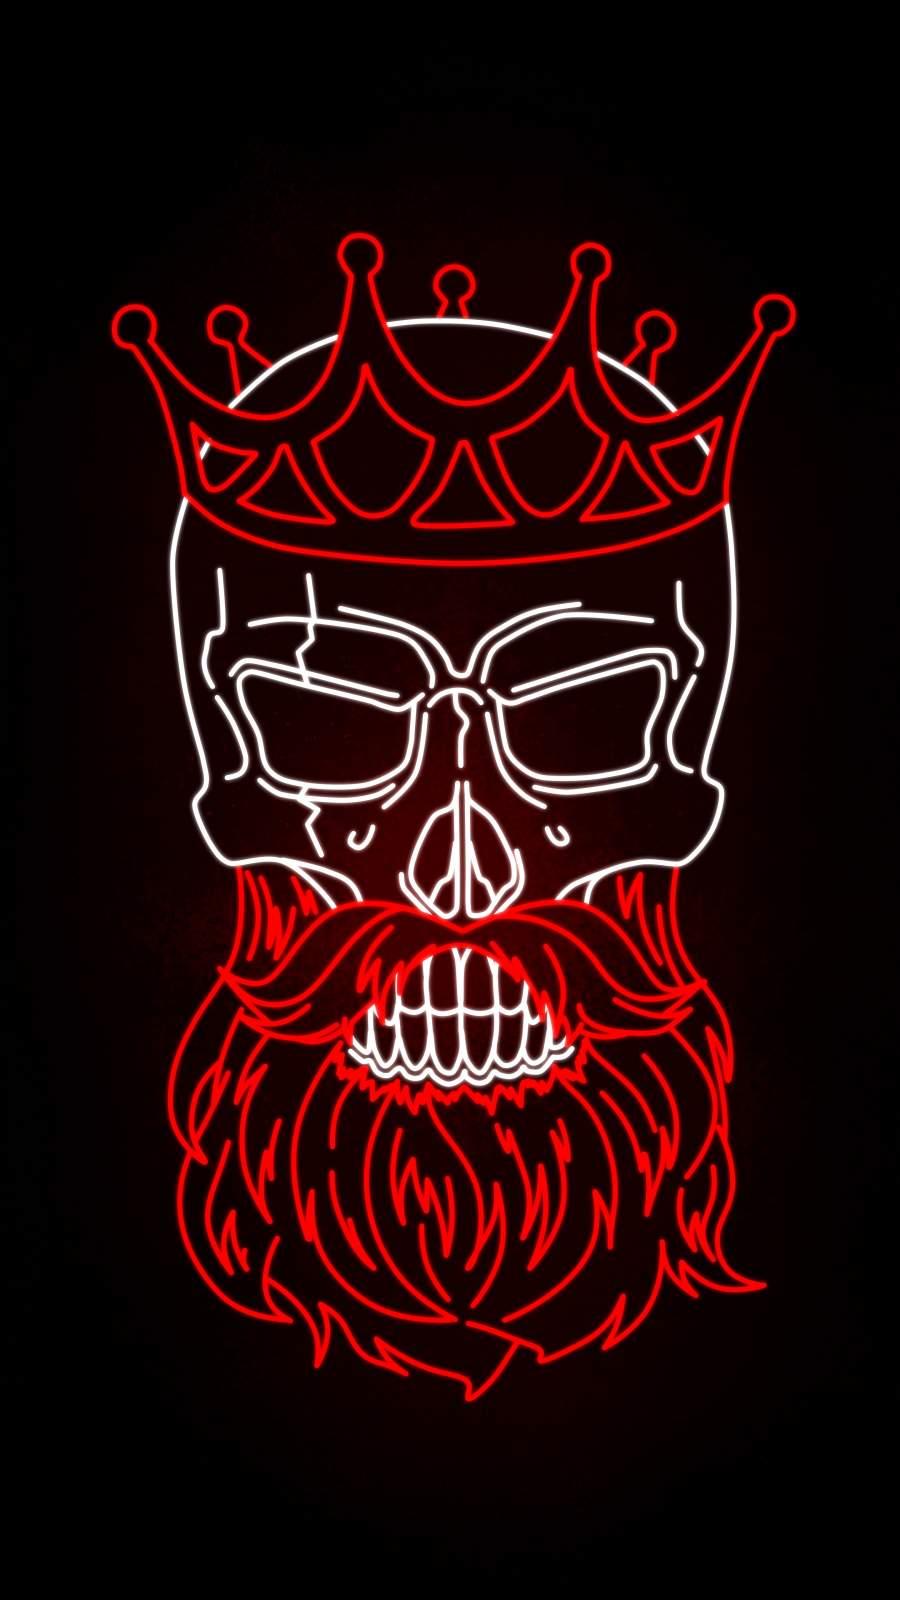 Neon Skull King